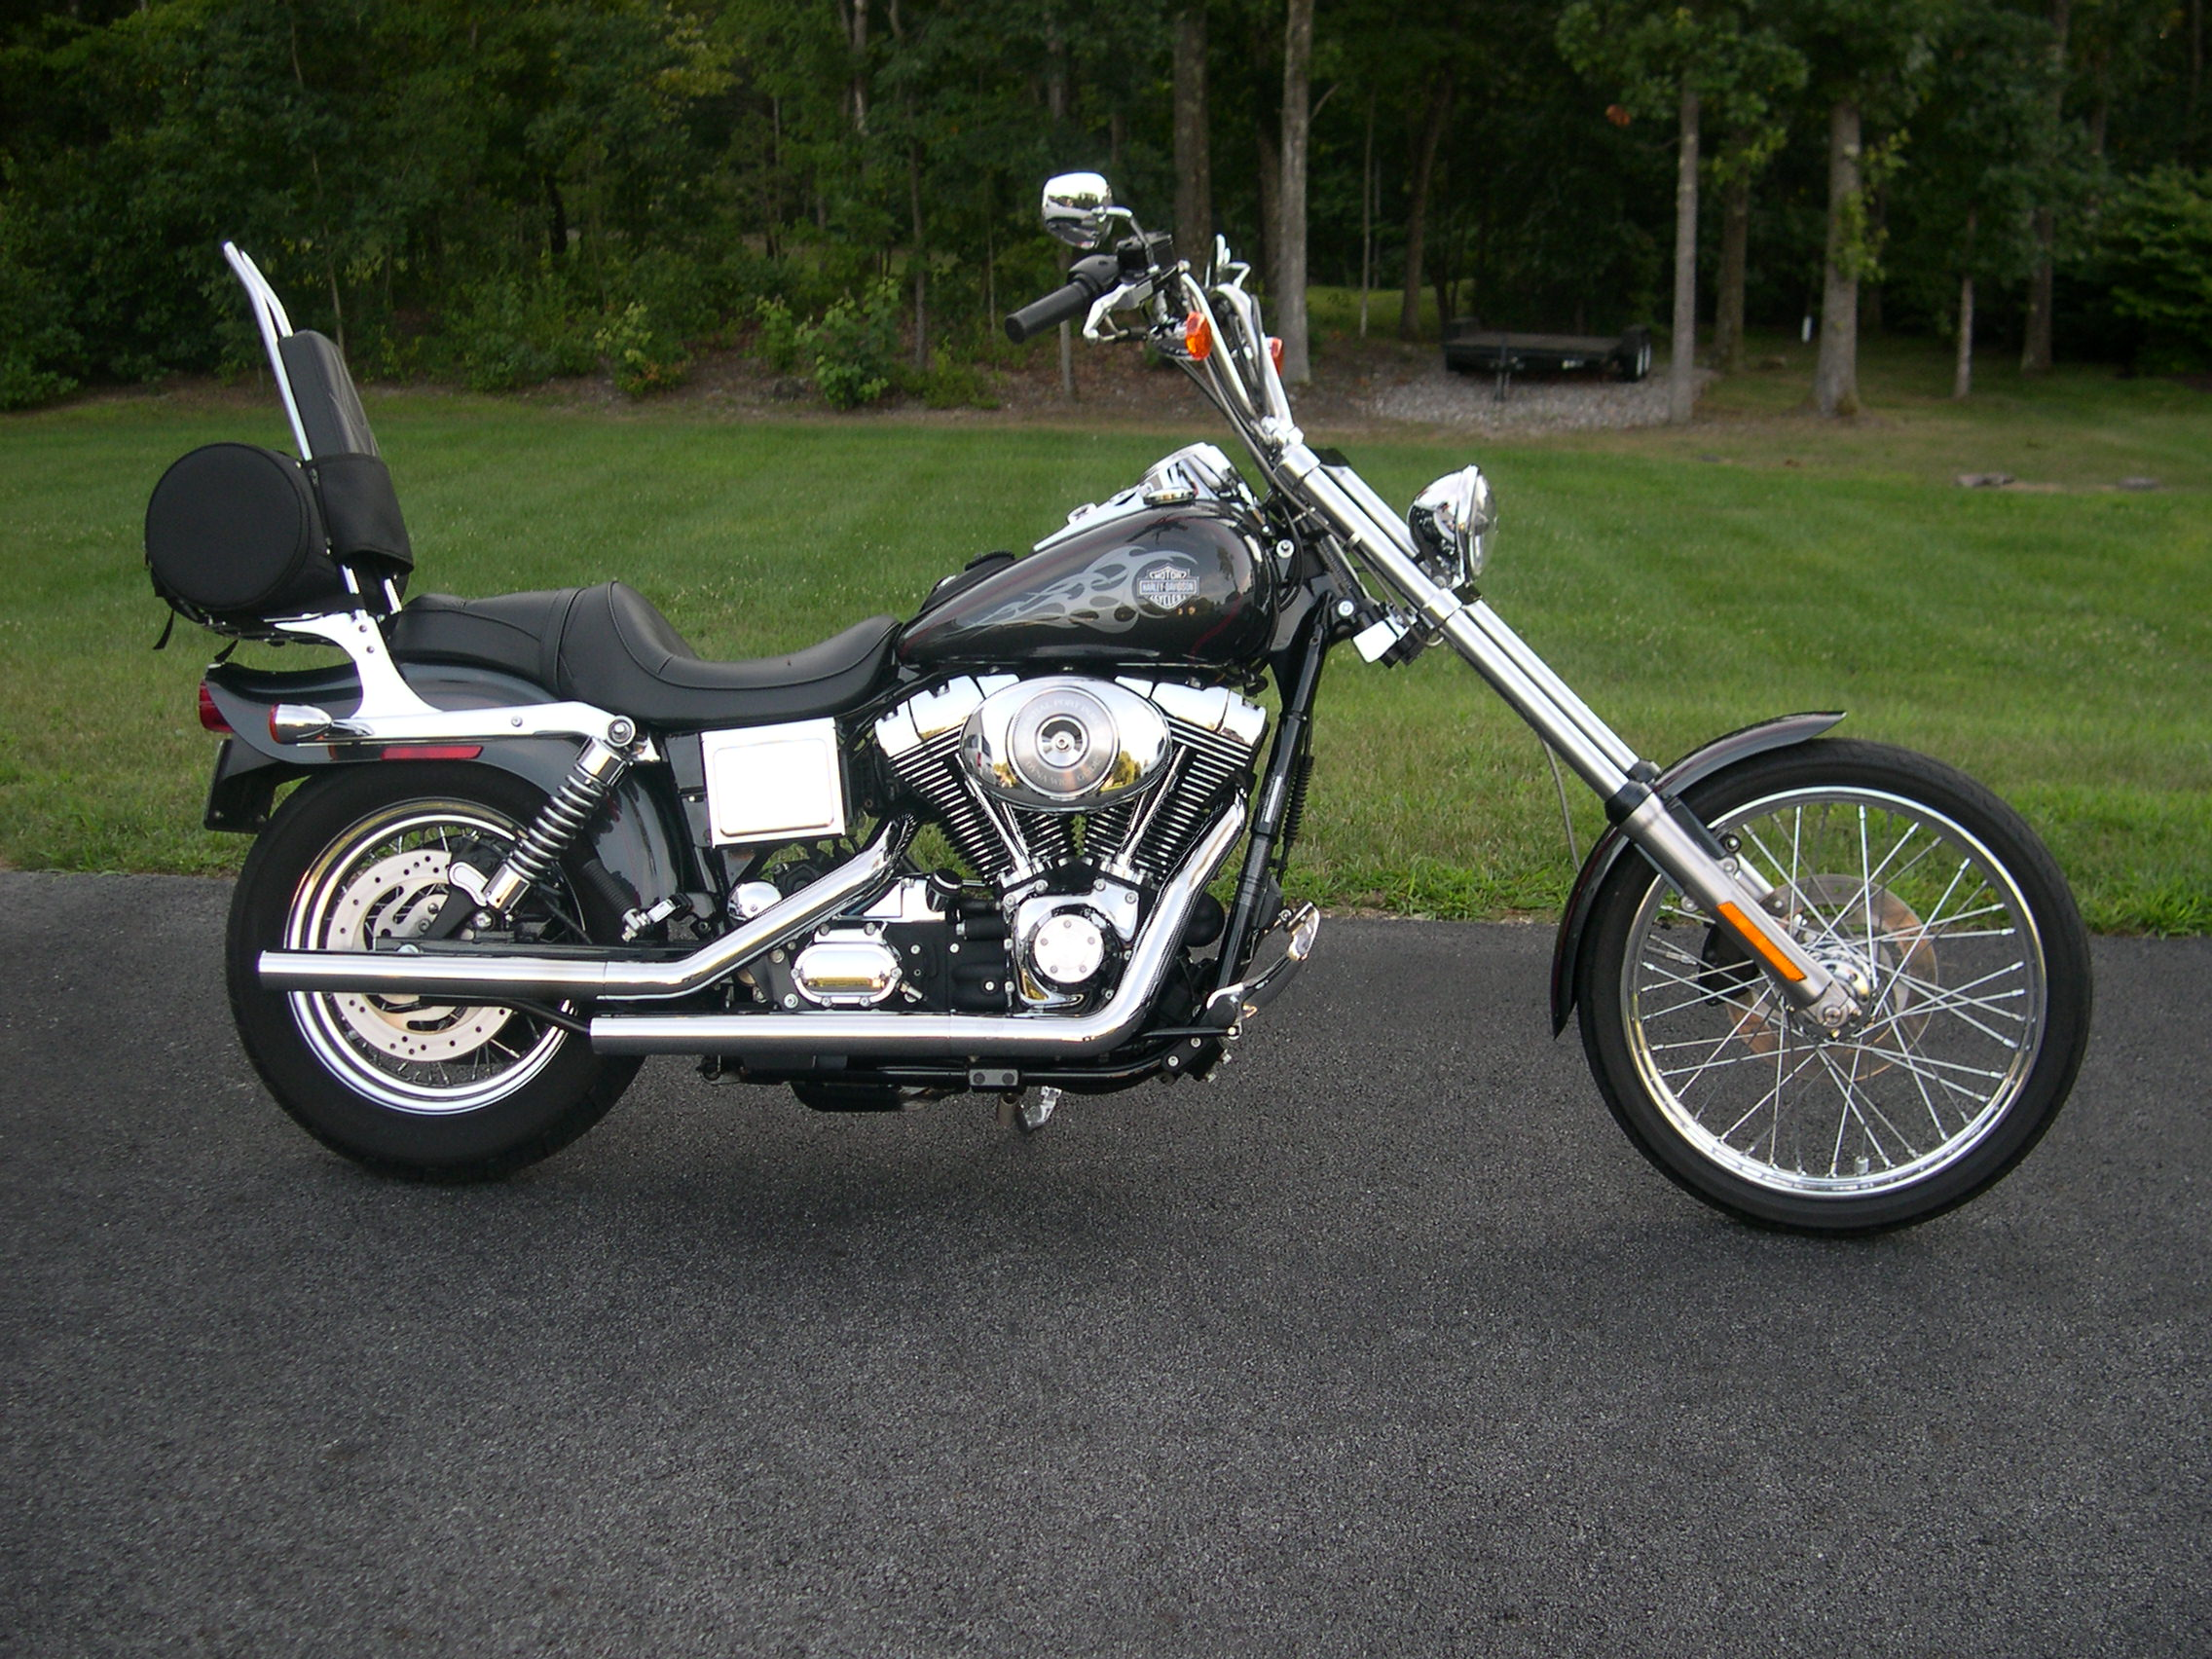 Harley Davidson Sportster Chopper Kits